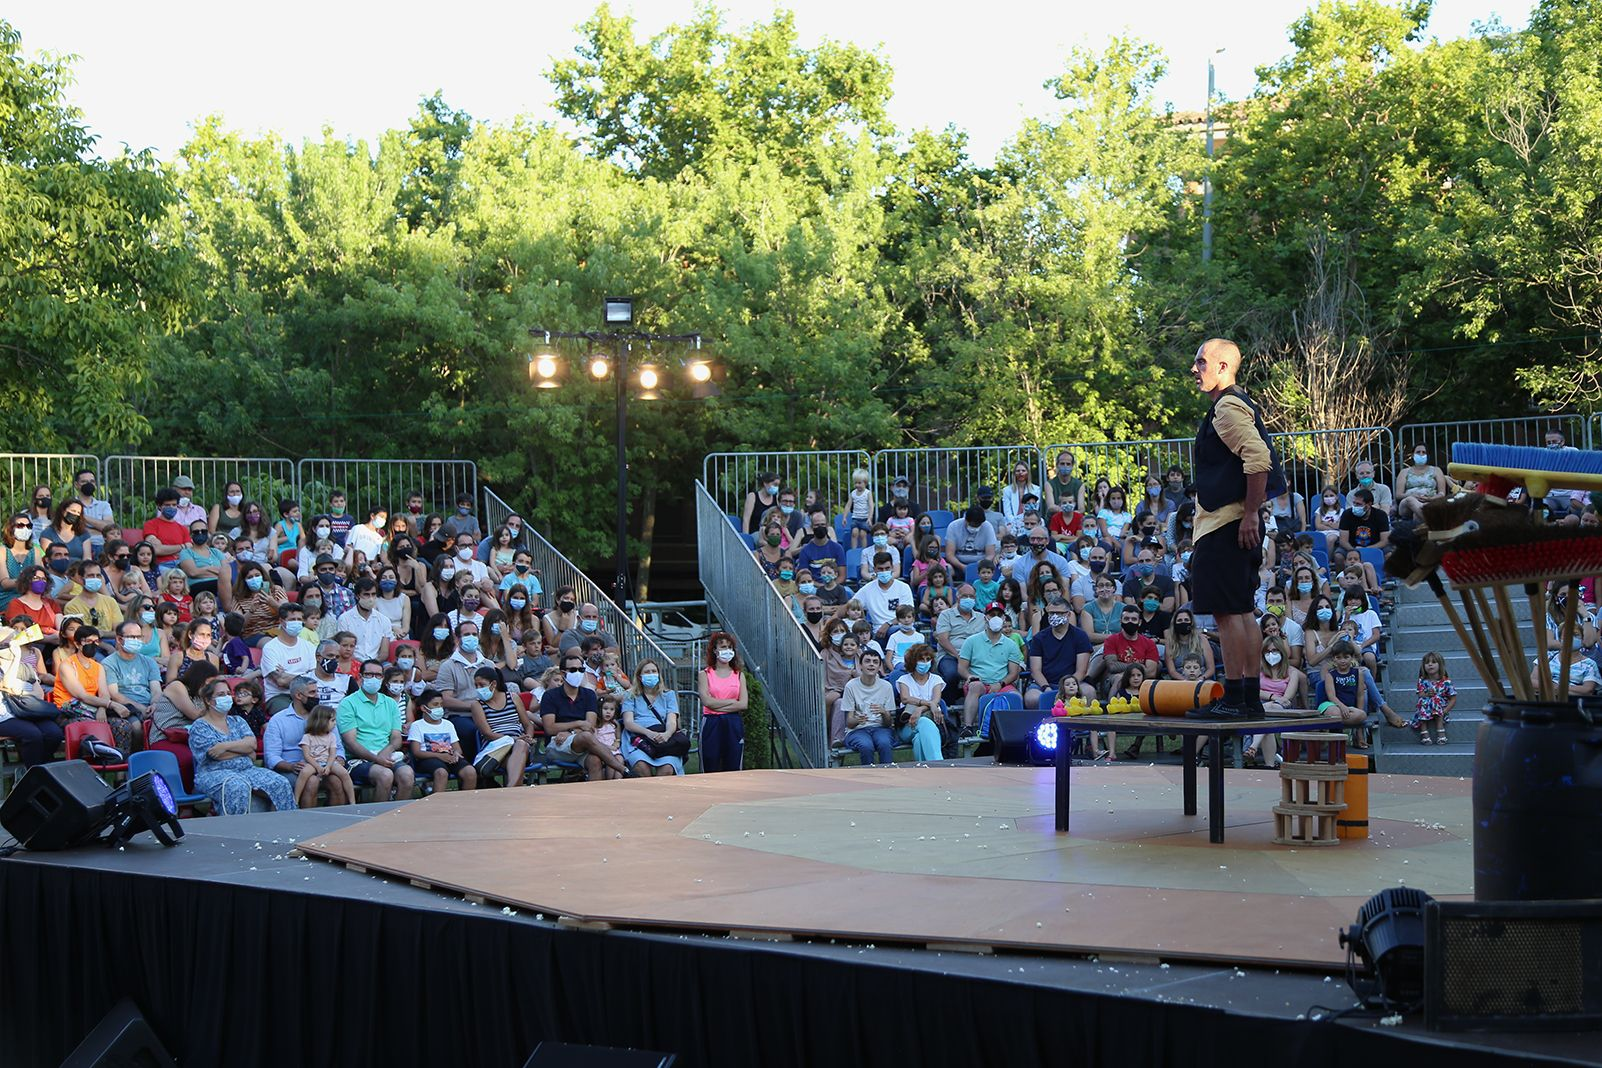 Espectacle del Circ Vermut. Foto: Anna Bassa